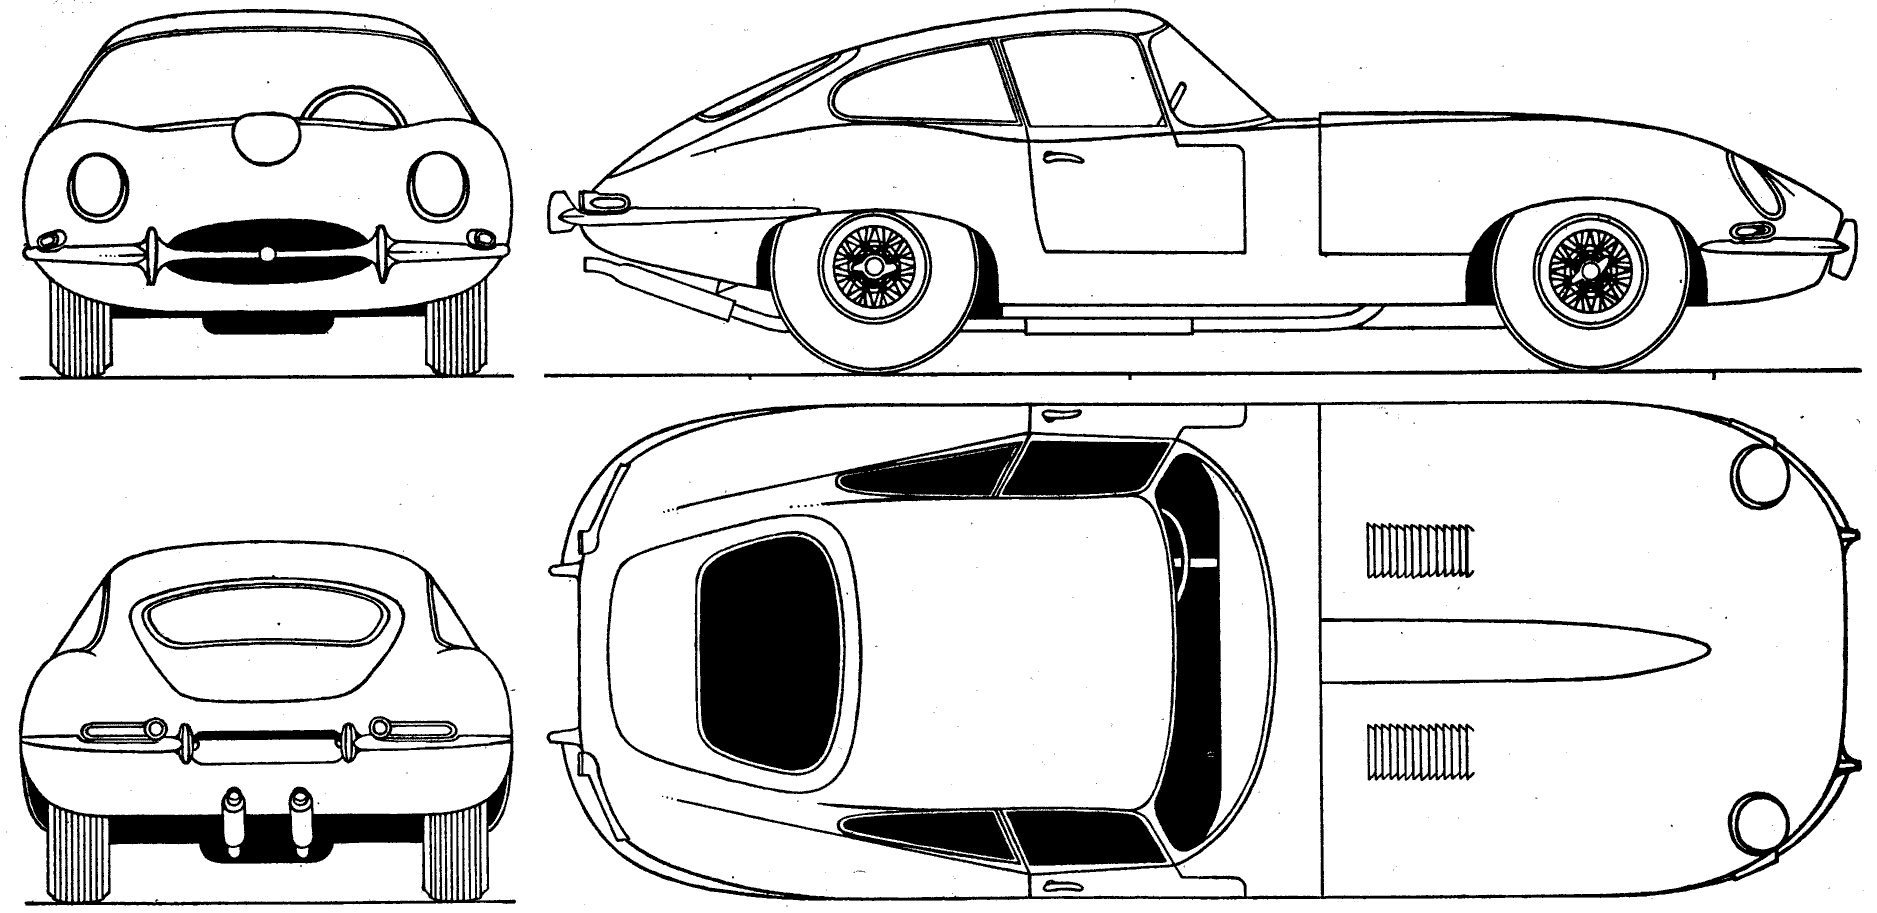 2011 challenger cars blueprints pinterest malvernweather Images